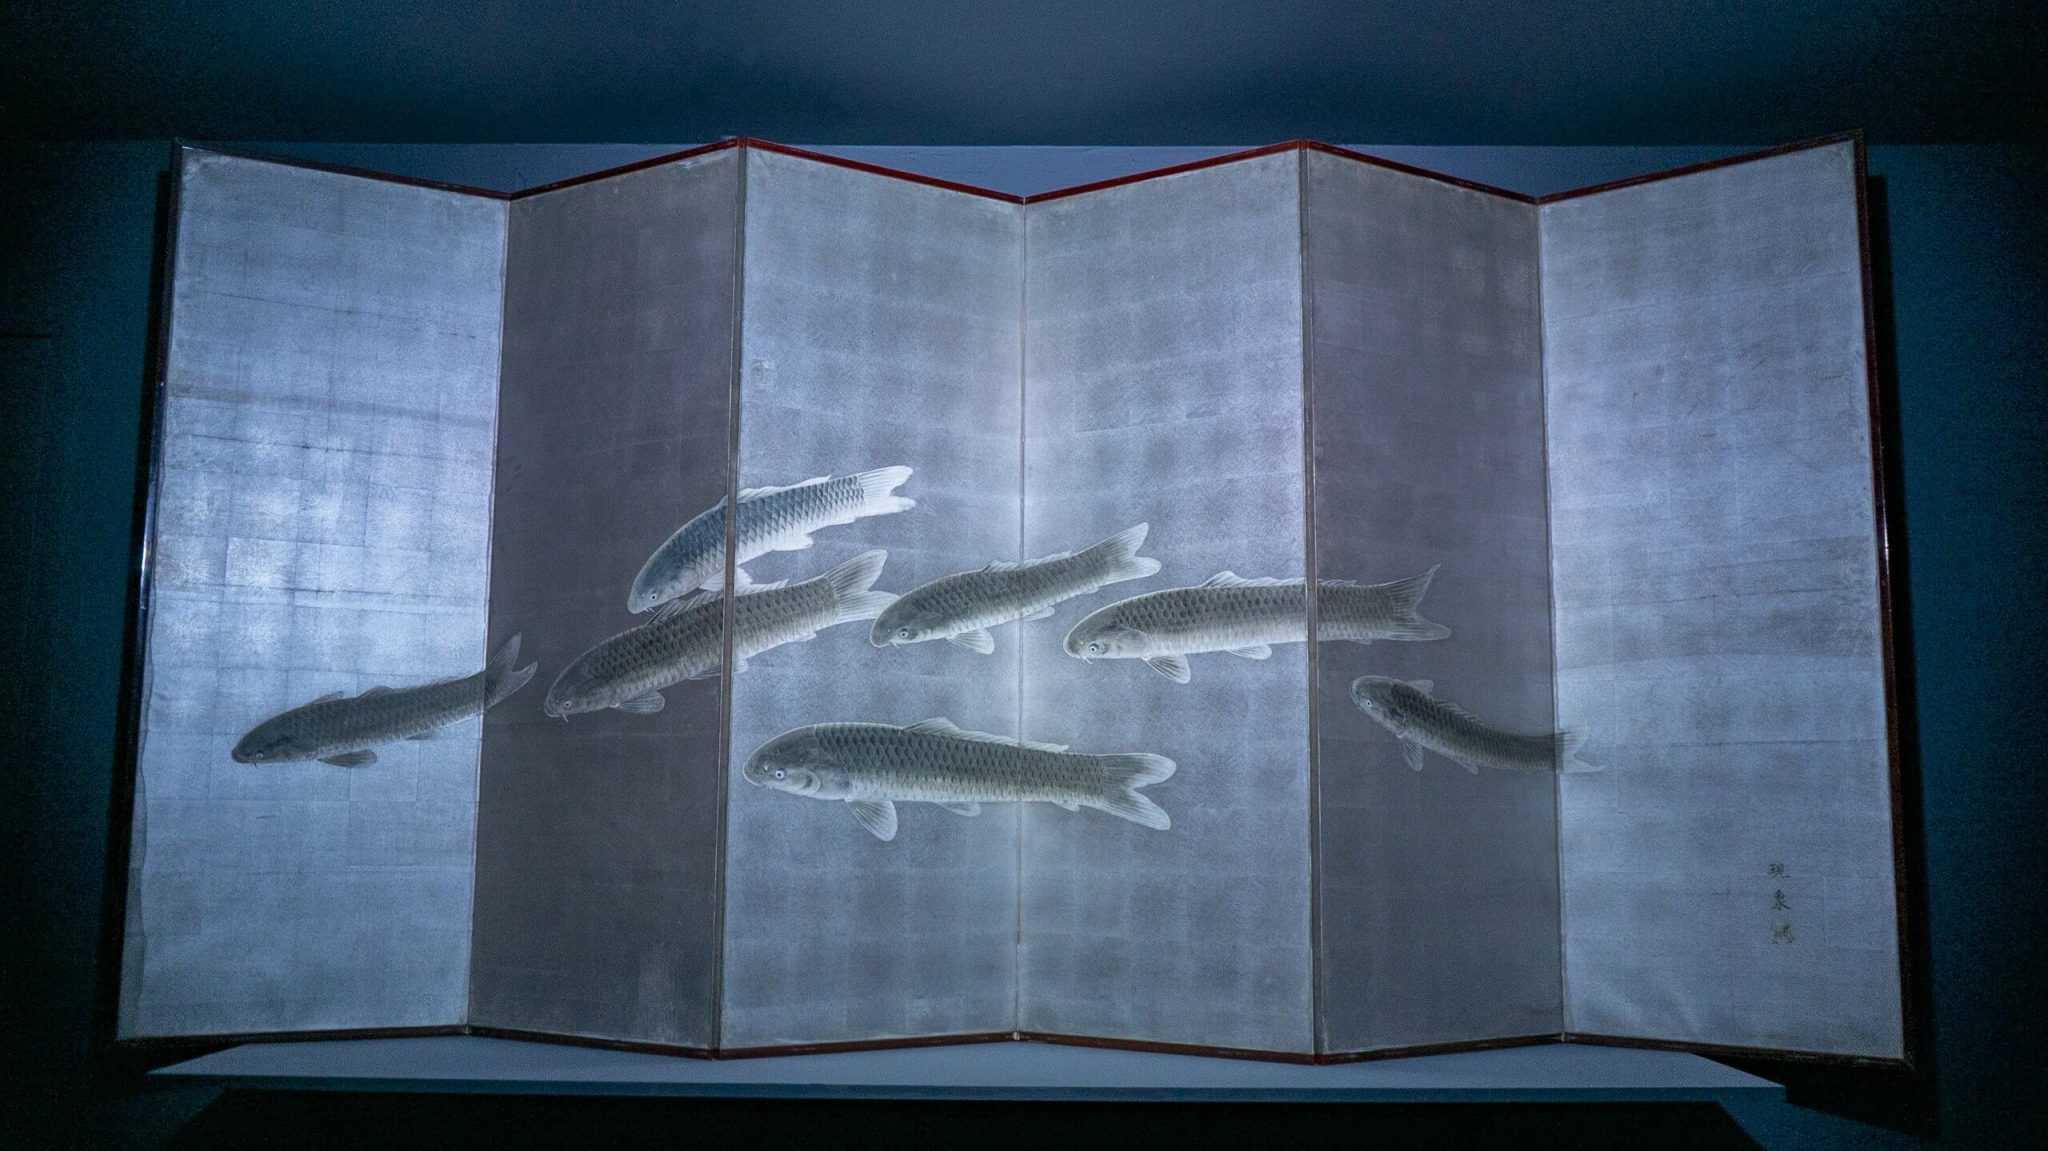 Paravent - Aquarium de Paris